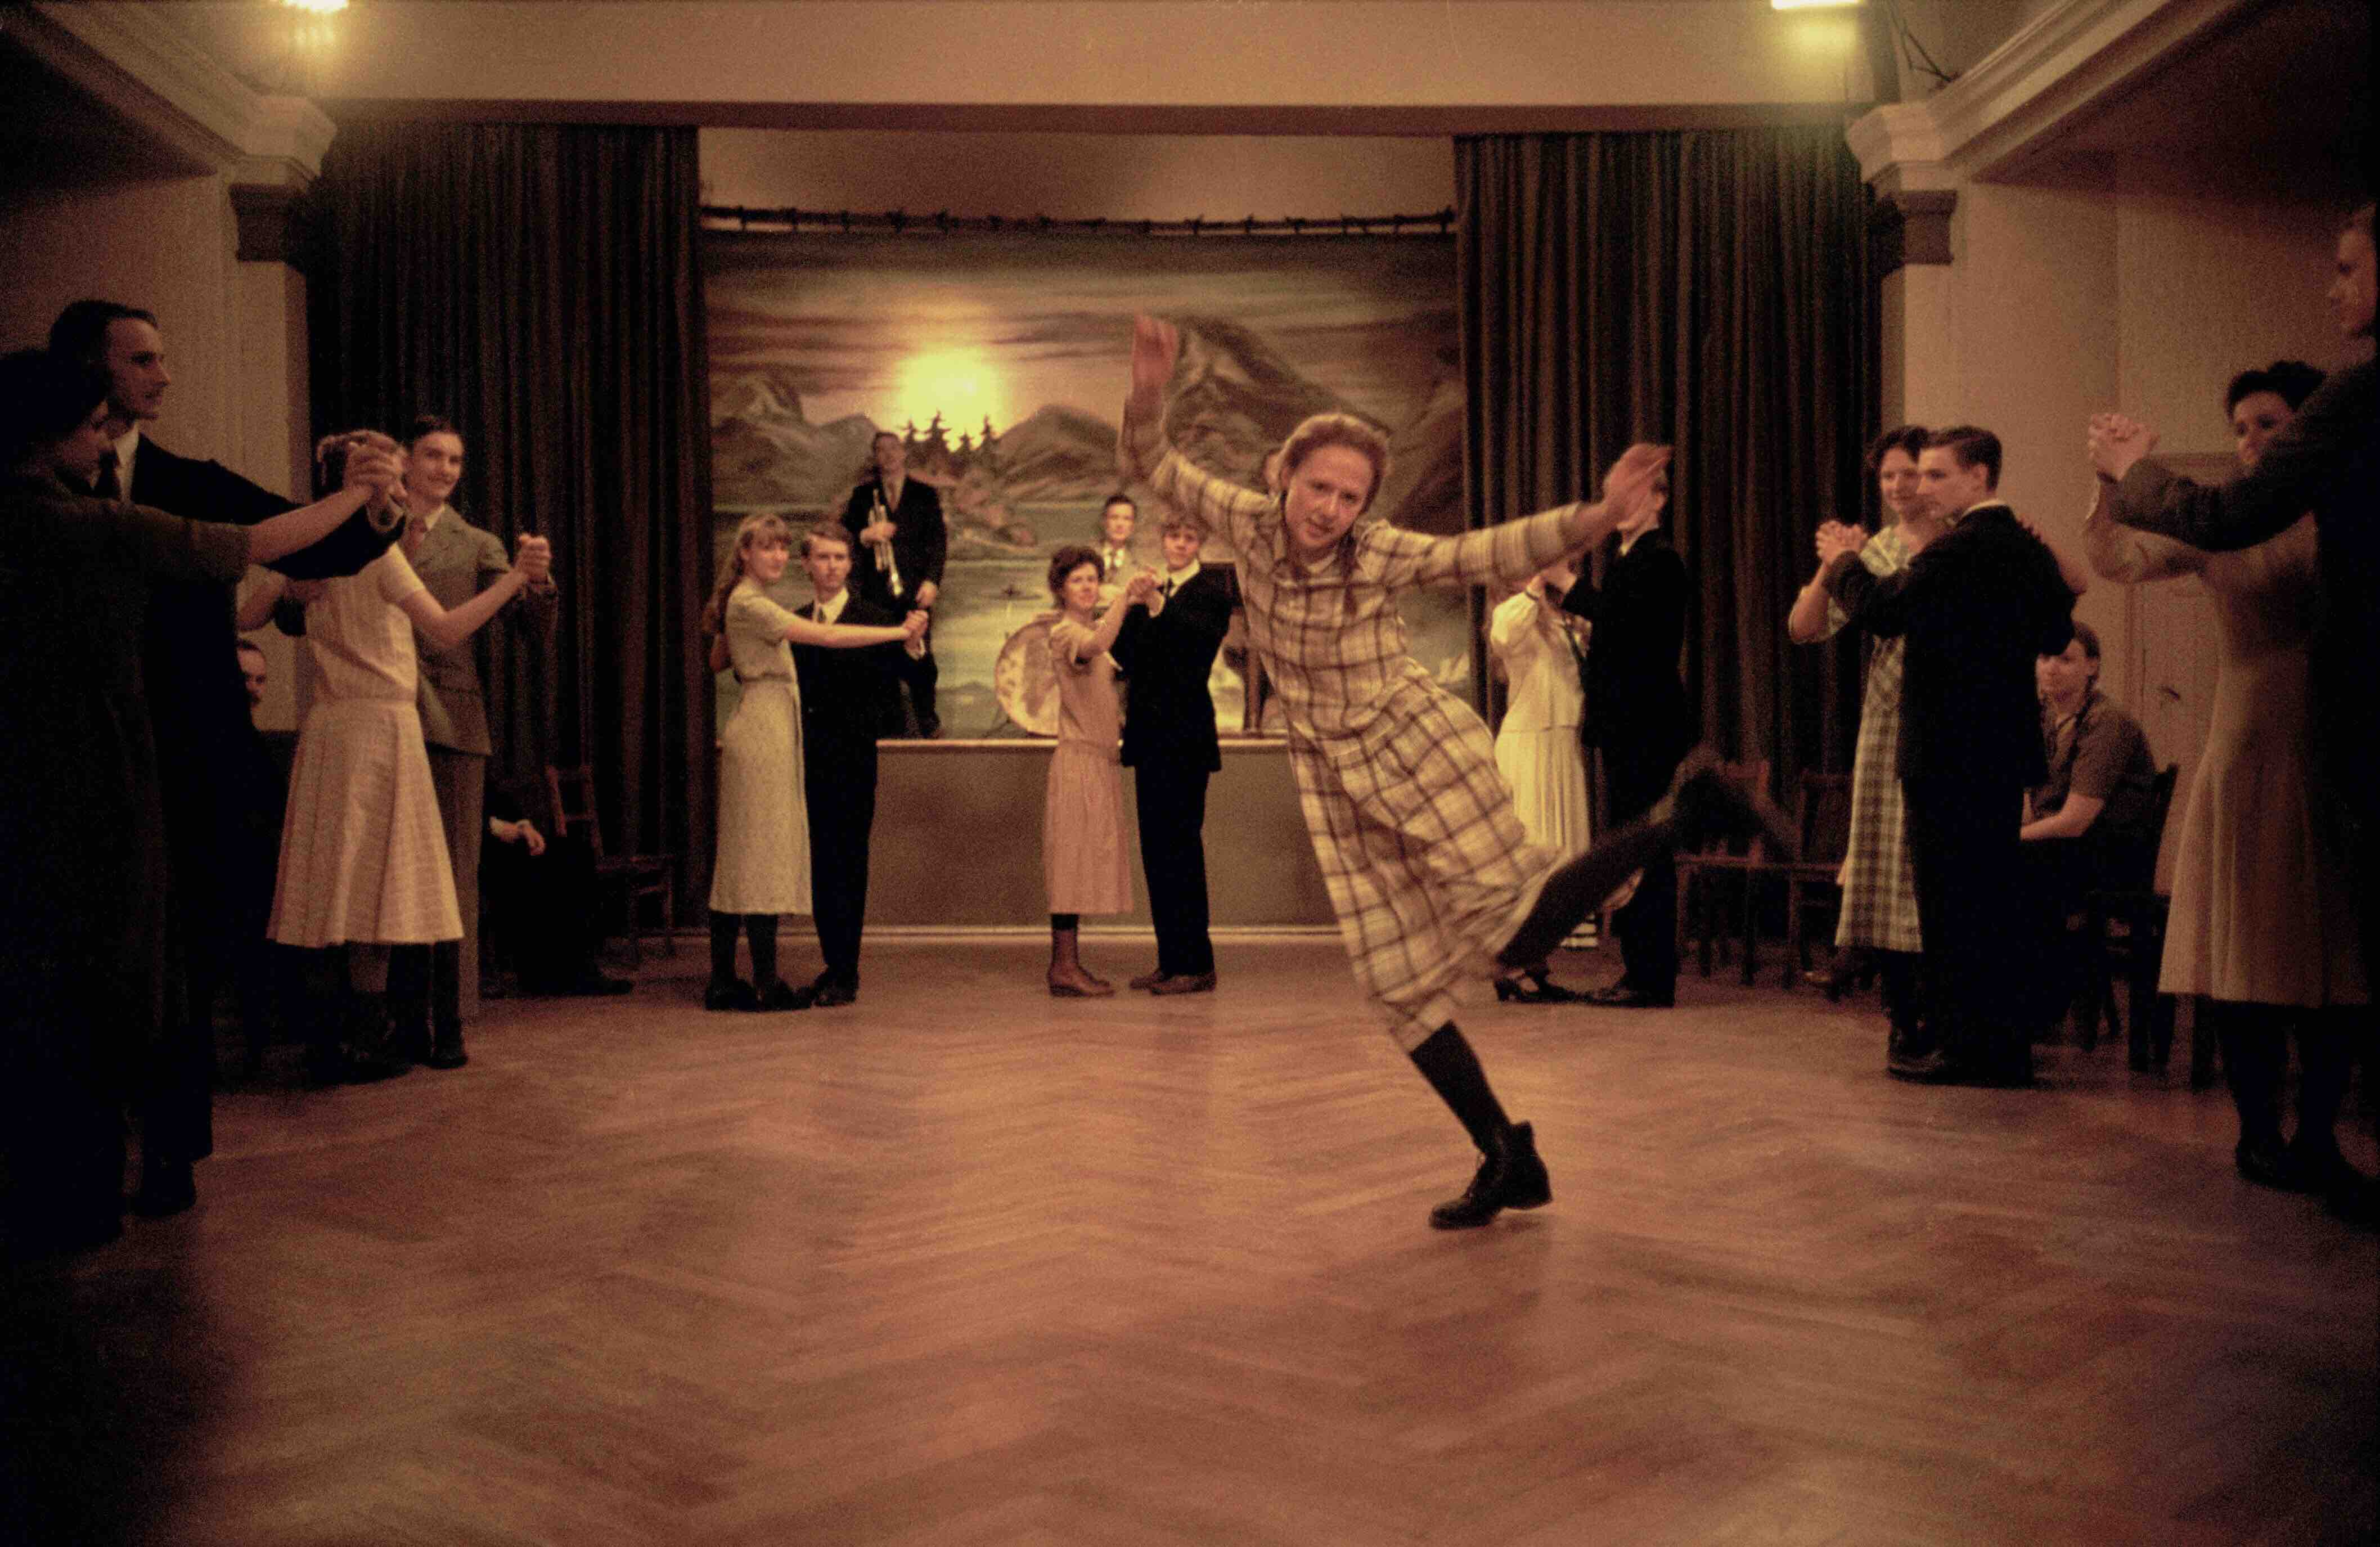 Becoming Astrid is dancing photo by Erik Molberg Hansen